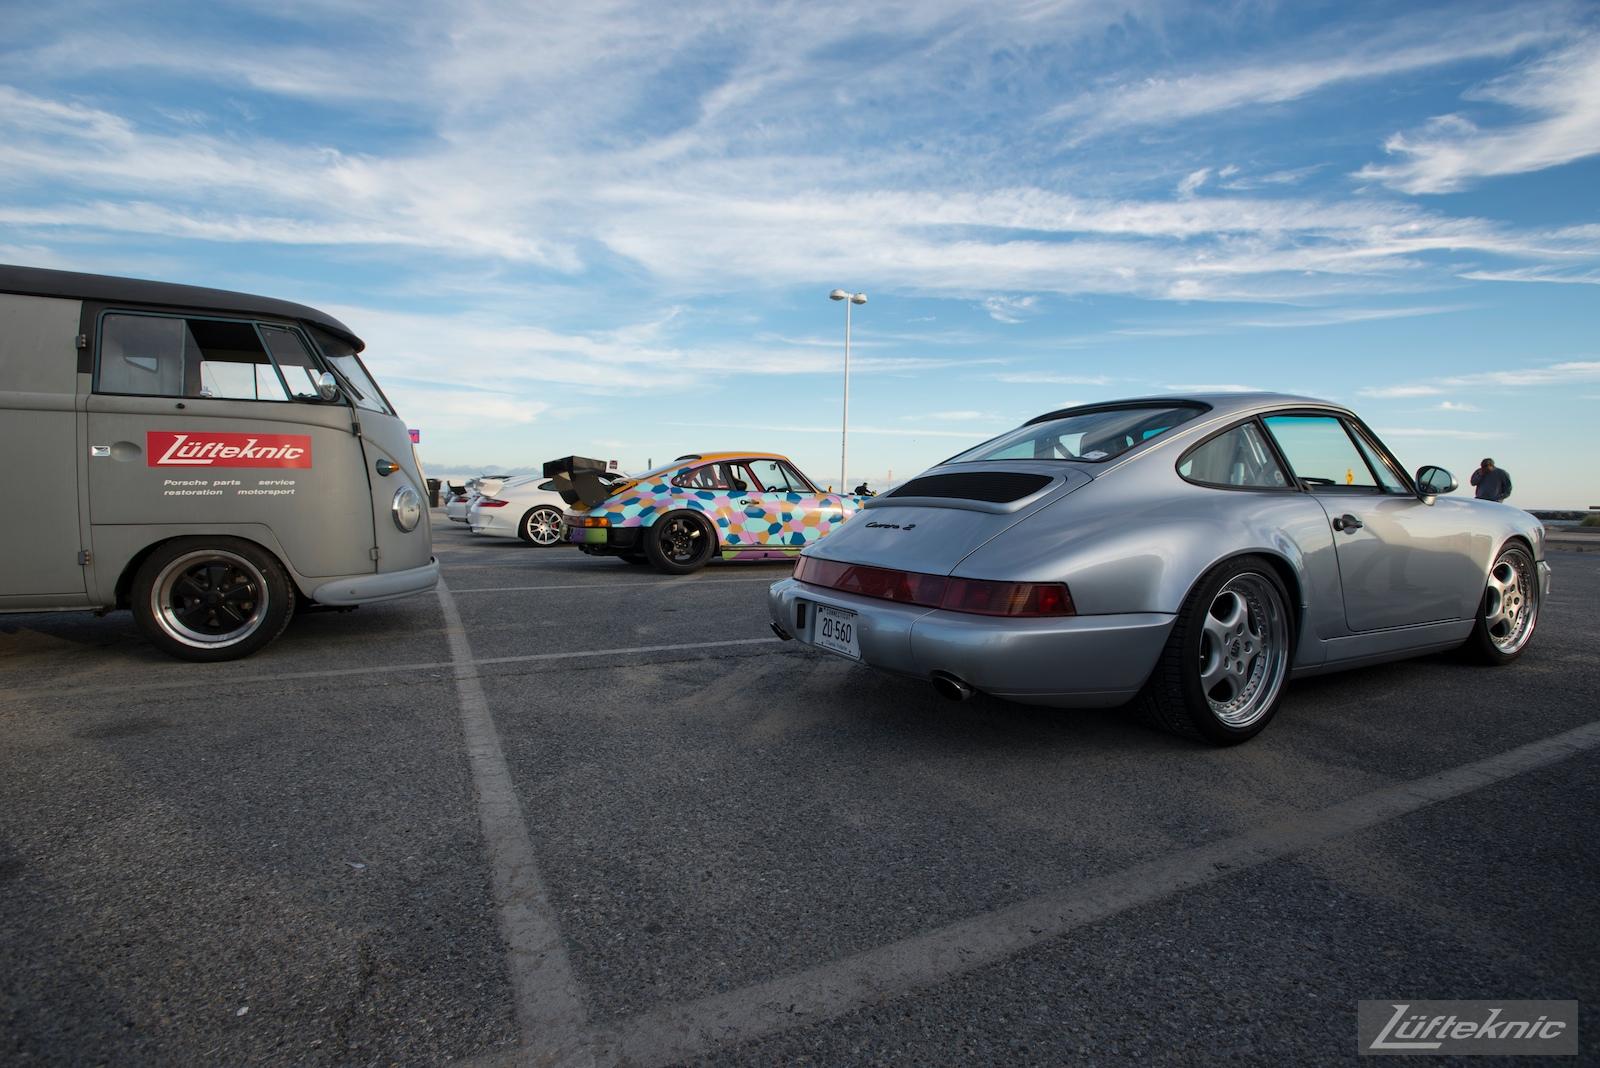 A Porsche 964 visits the Lüfteknic #projectstuka Porsche 930 Turbo